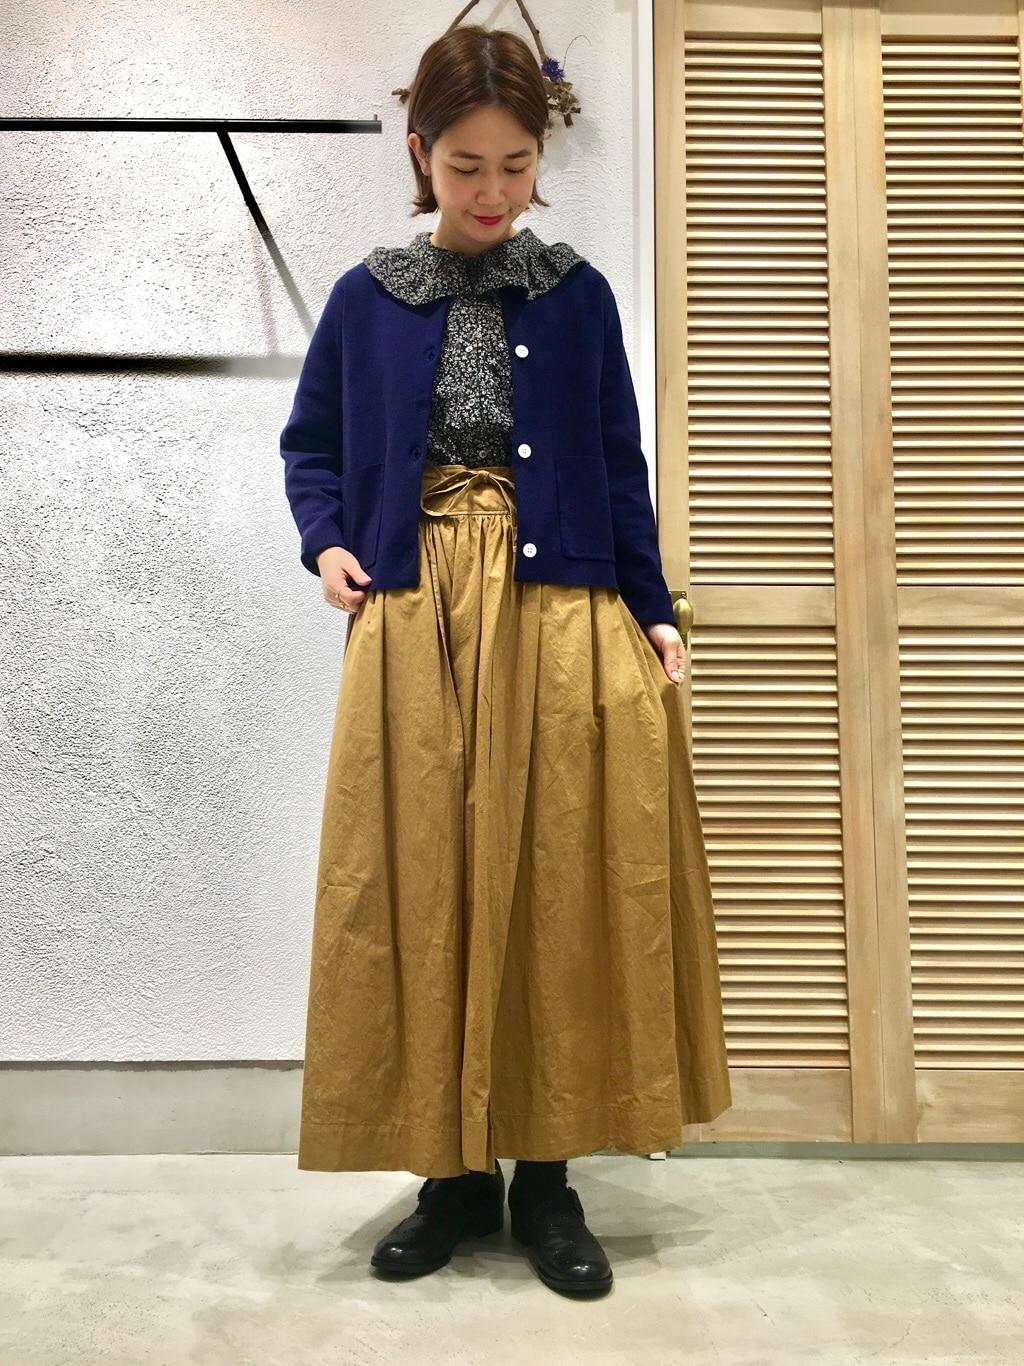 chambre de charme 横浜ジョイナス 身長:160cm 2021.01.15